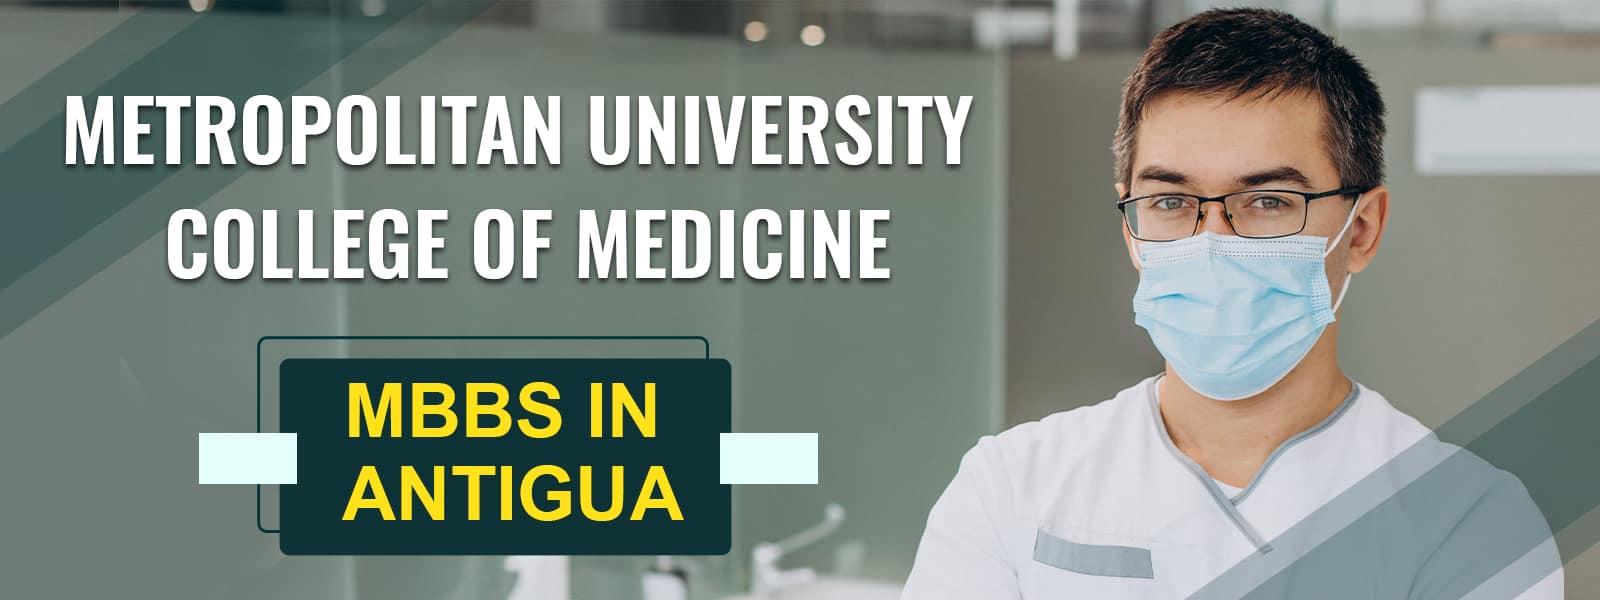 Metropolitan University College of Medicine Antigua